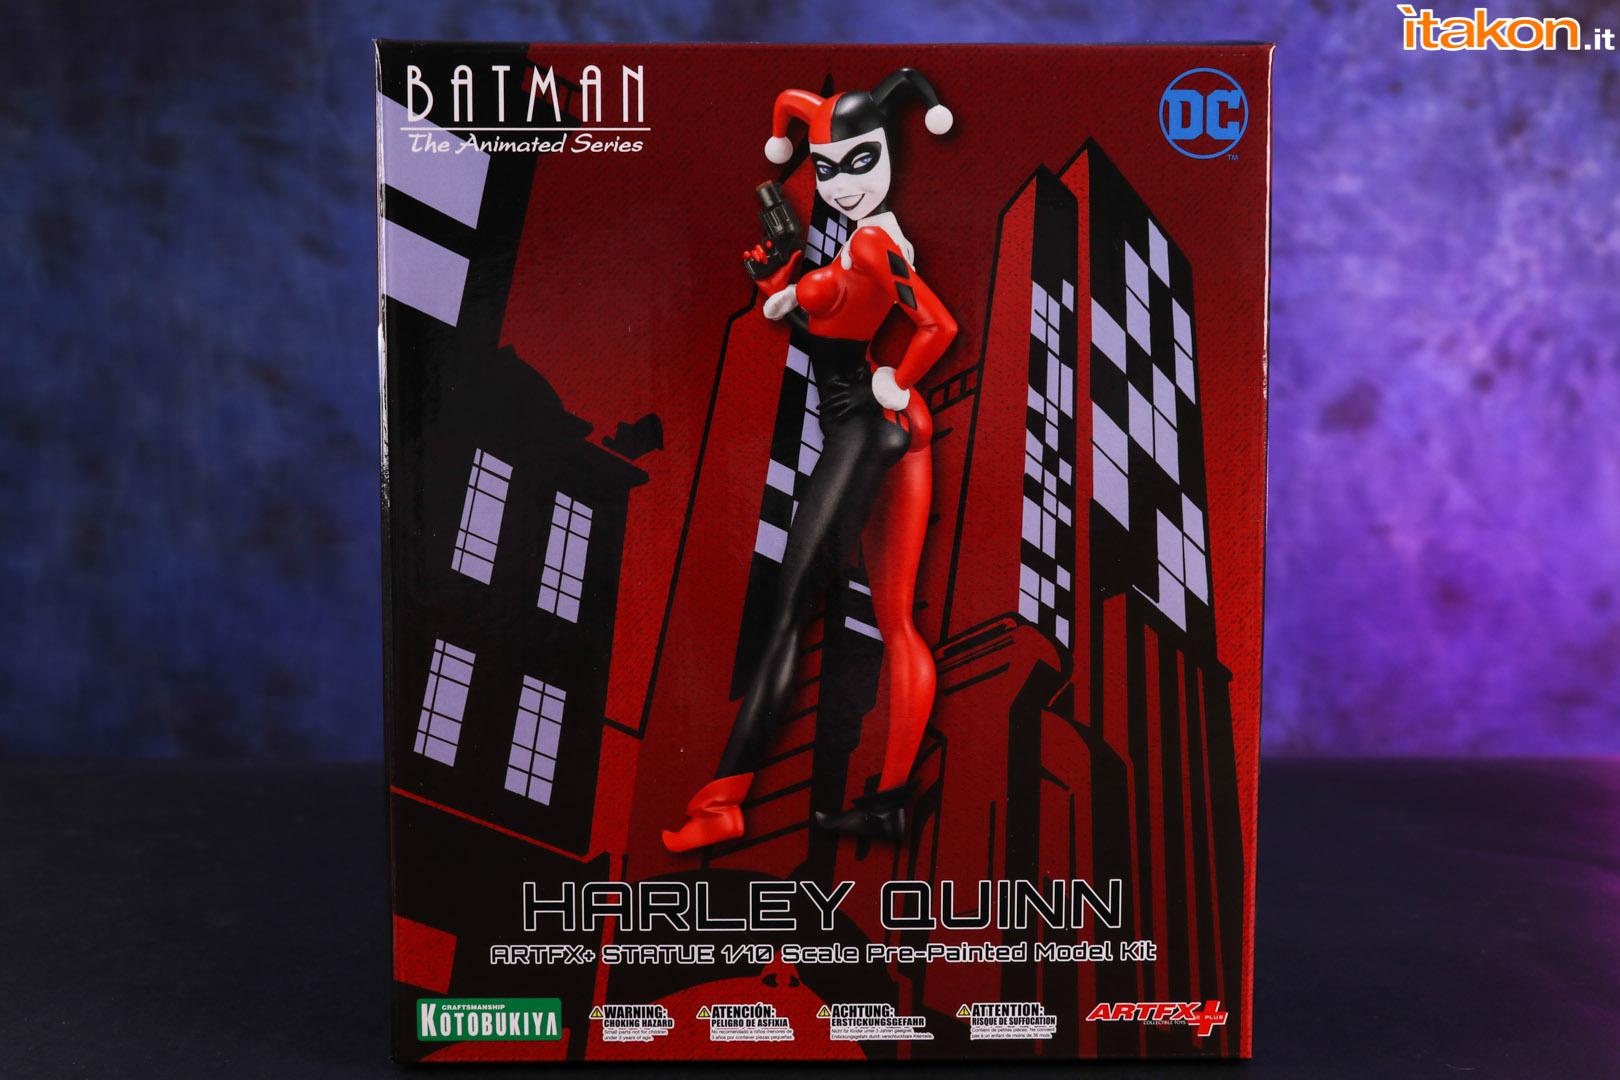 Link a Harley Quinn Koto001